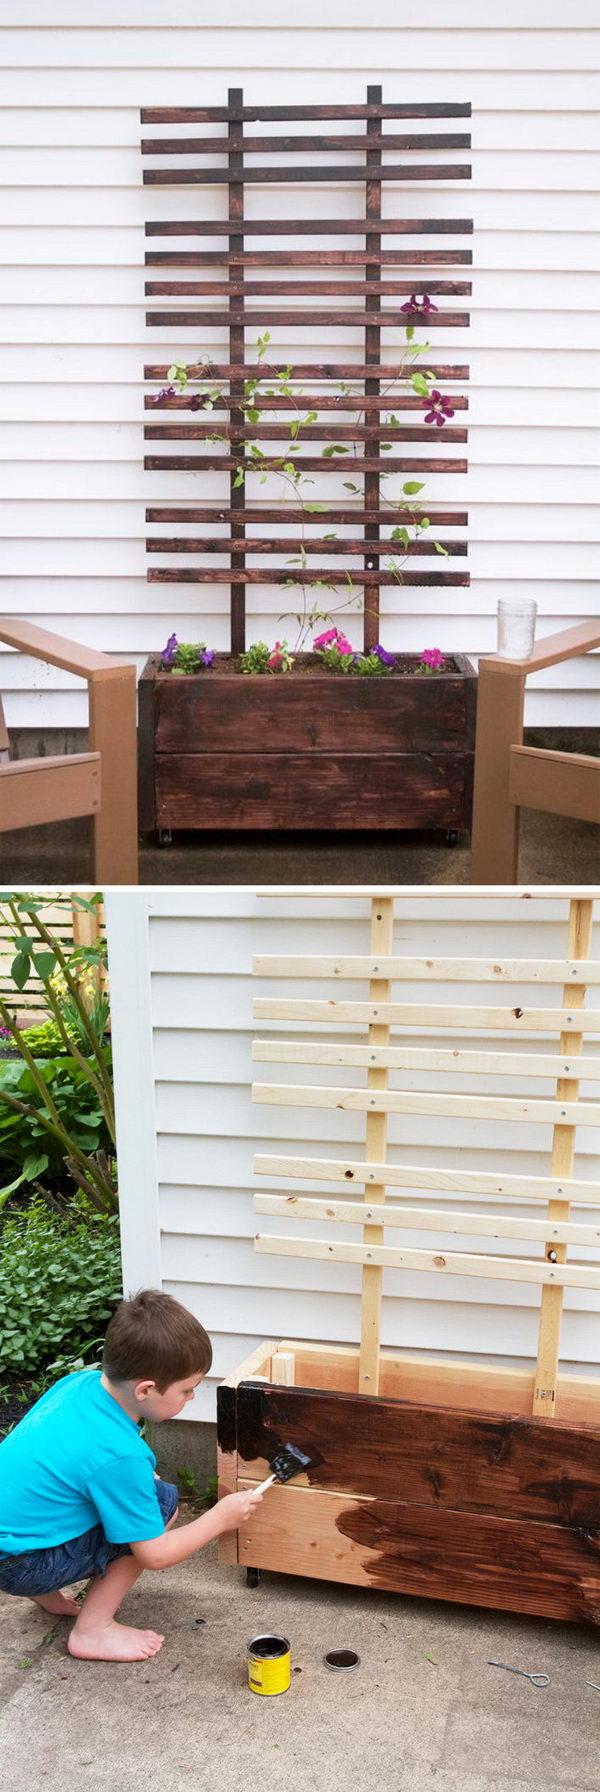 DIY Trellis Planter Box.